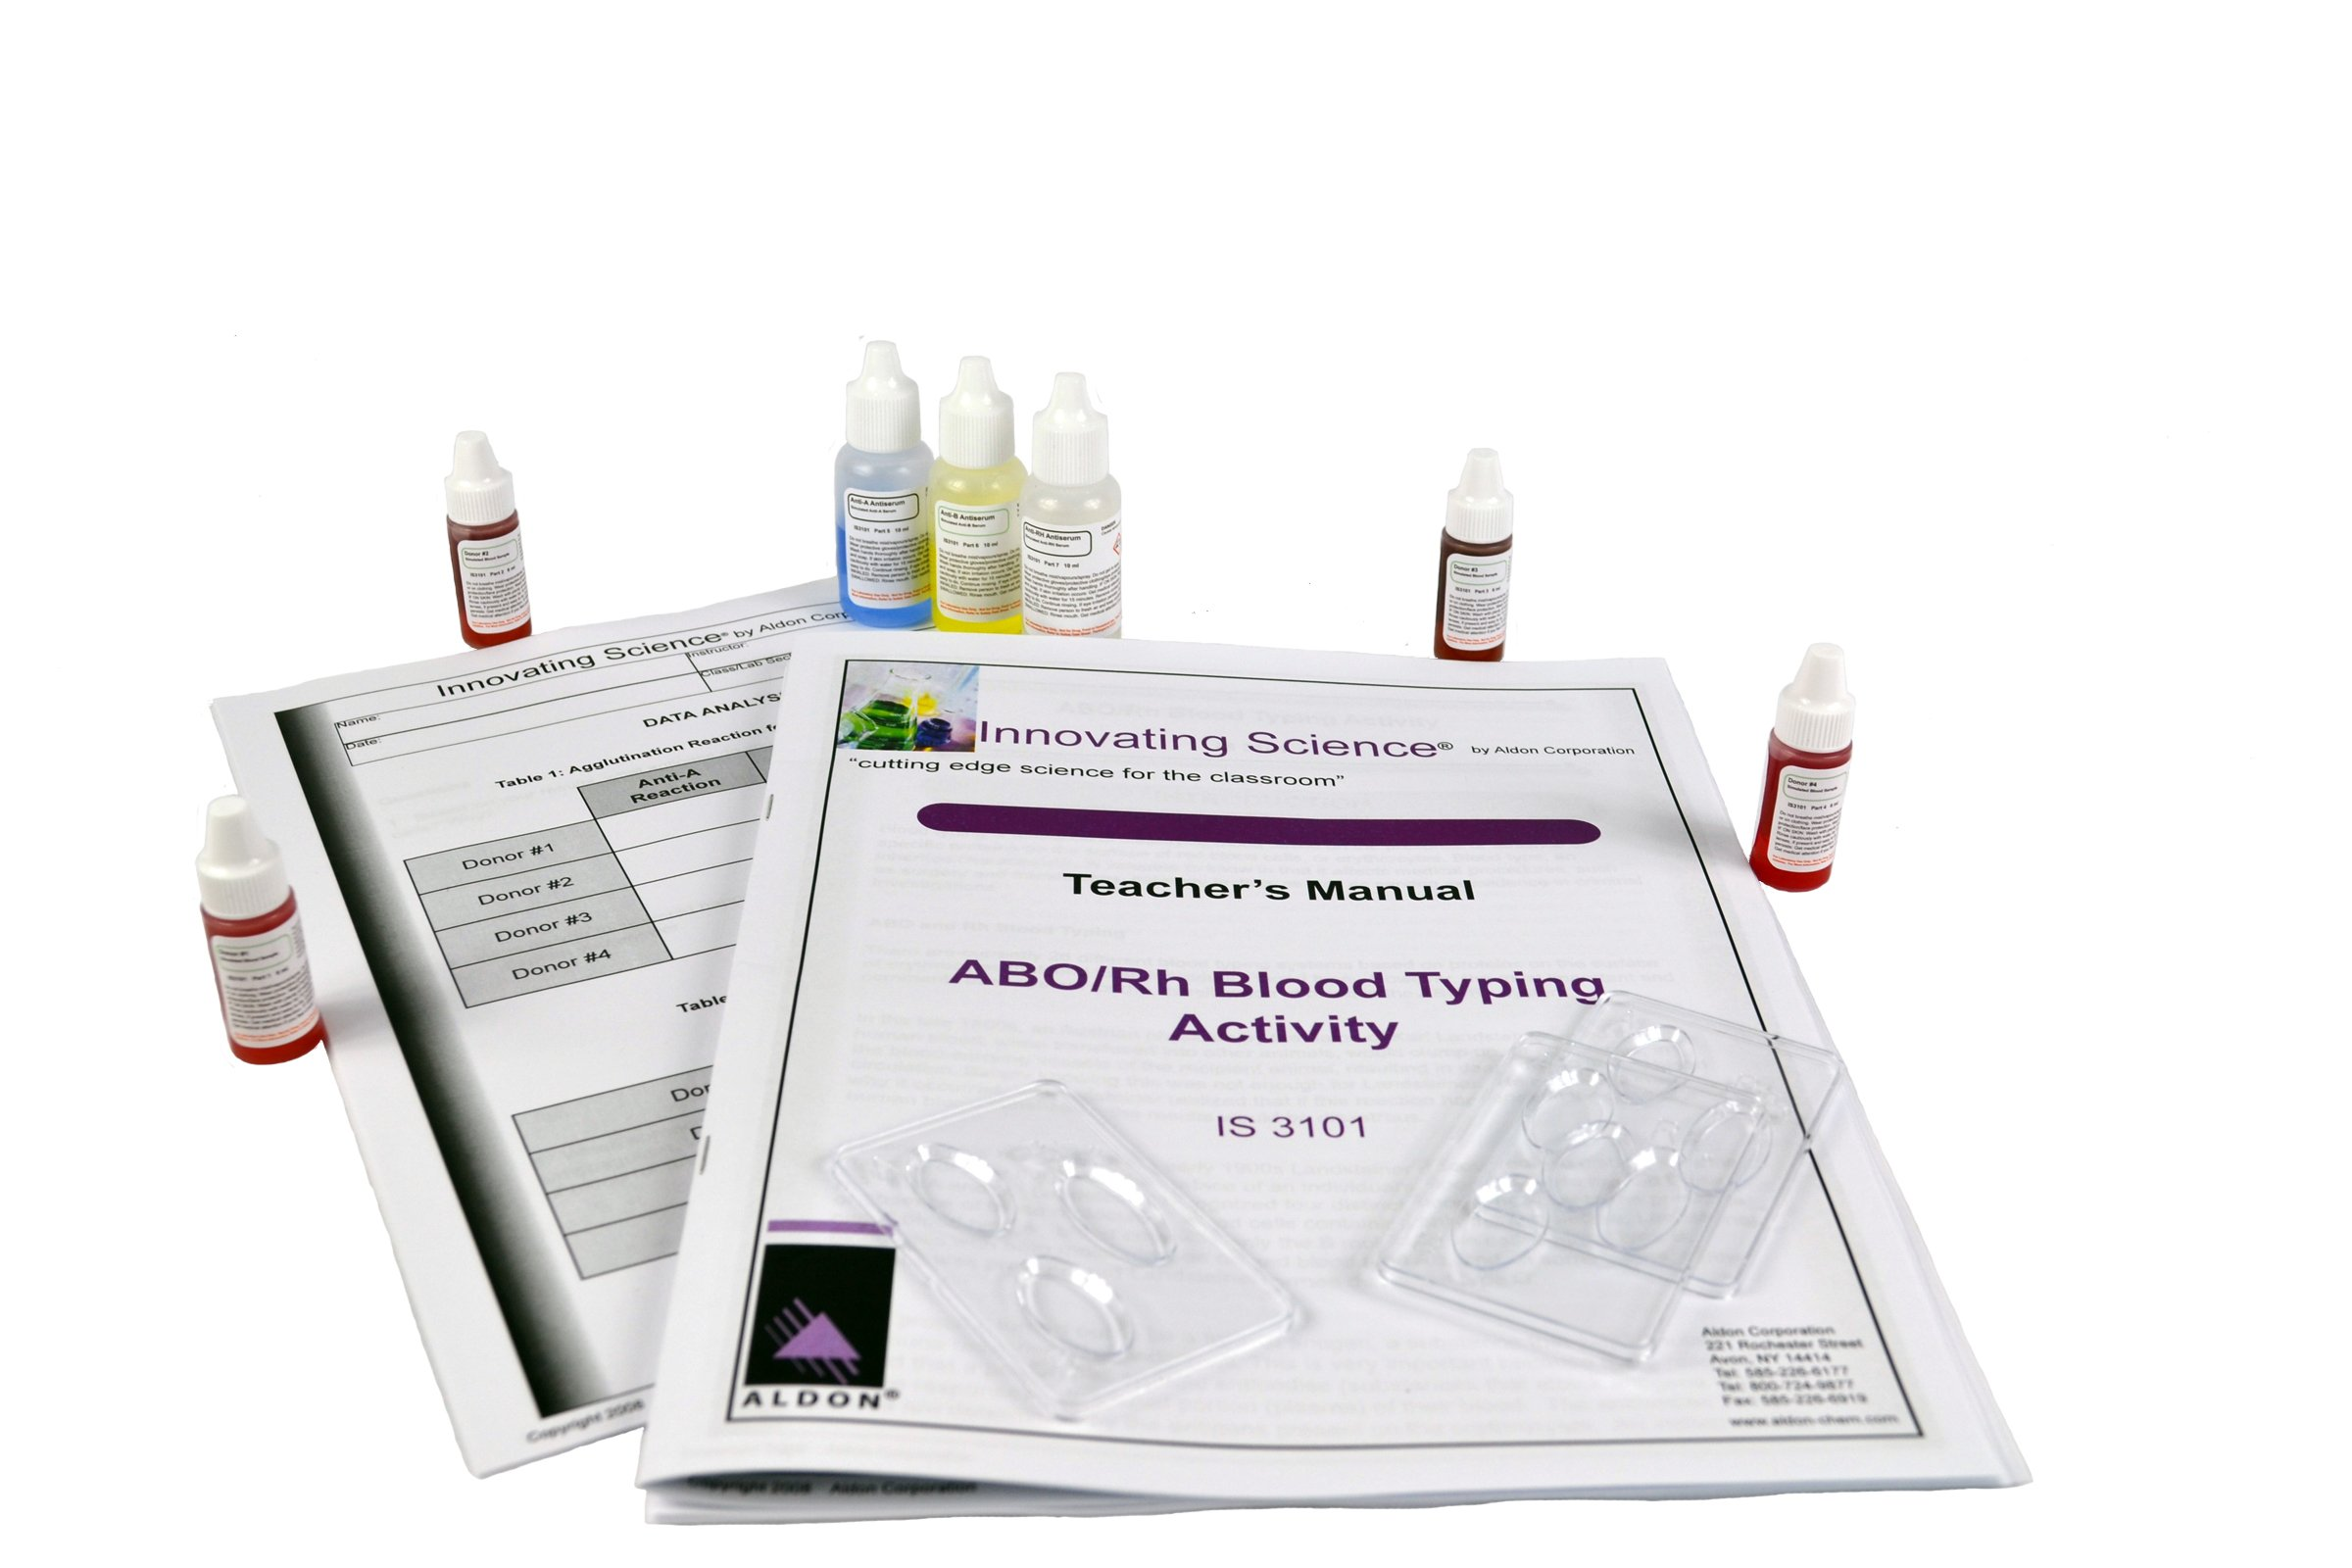 Innovating Science - ABO/Rh Blood Typing Kit